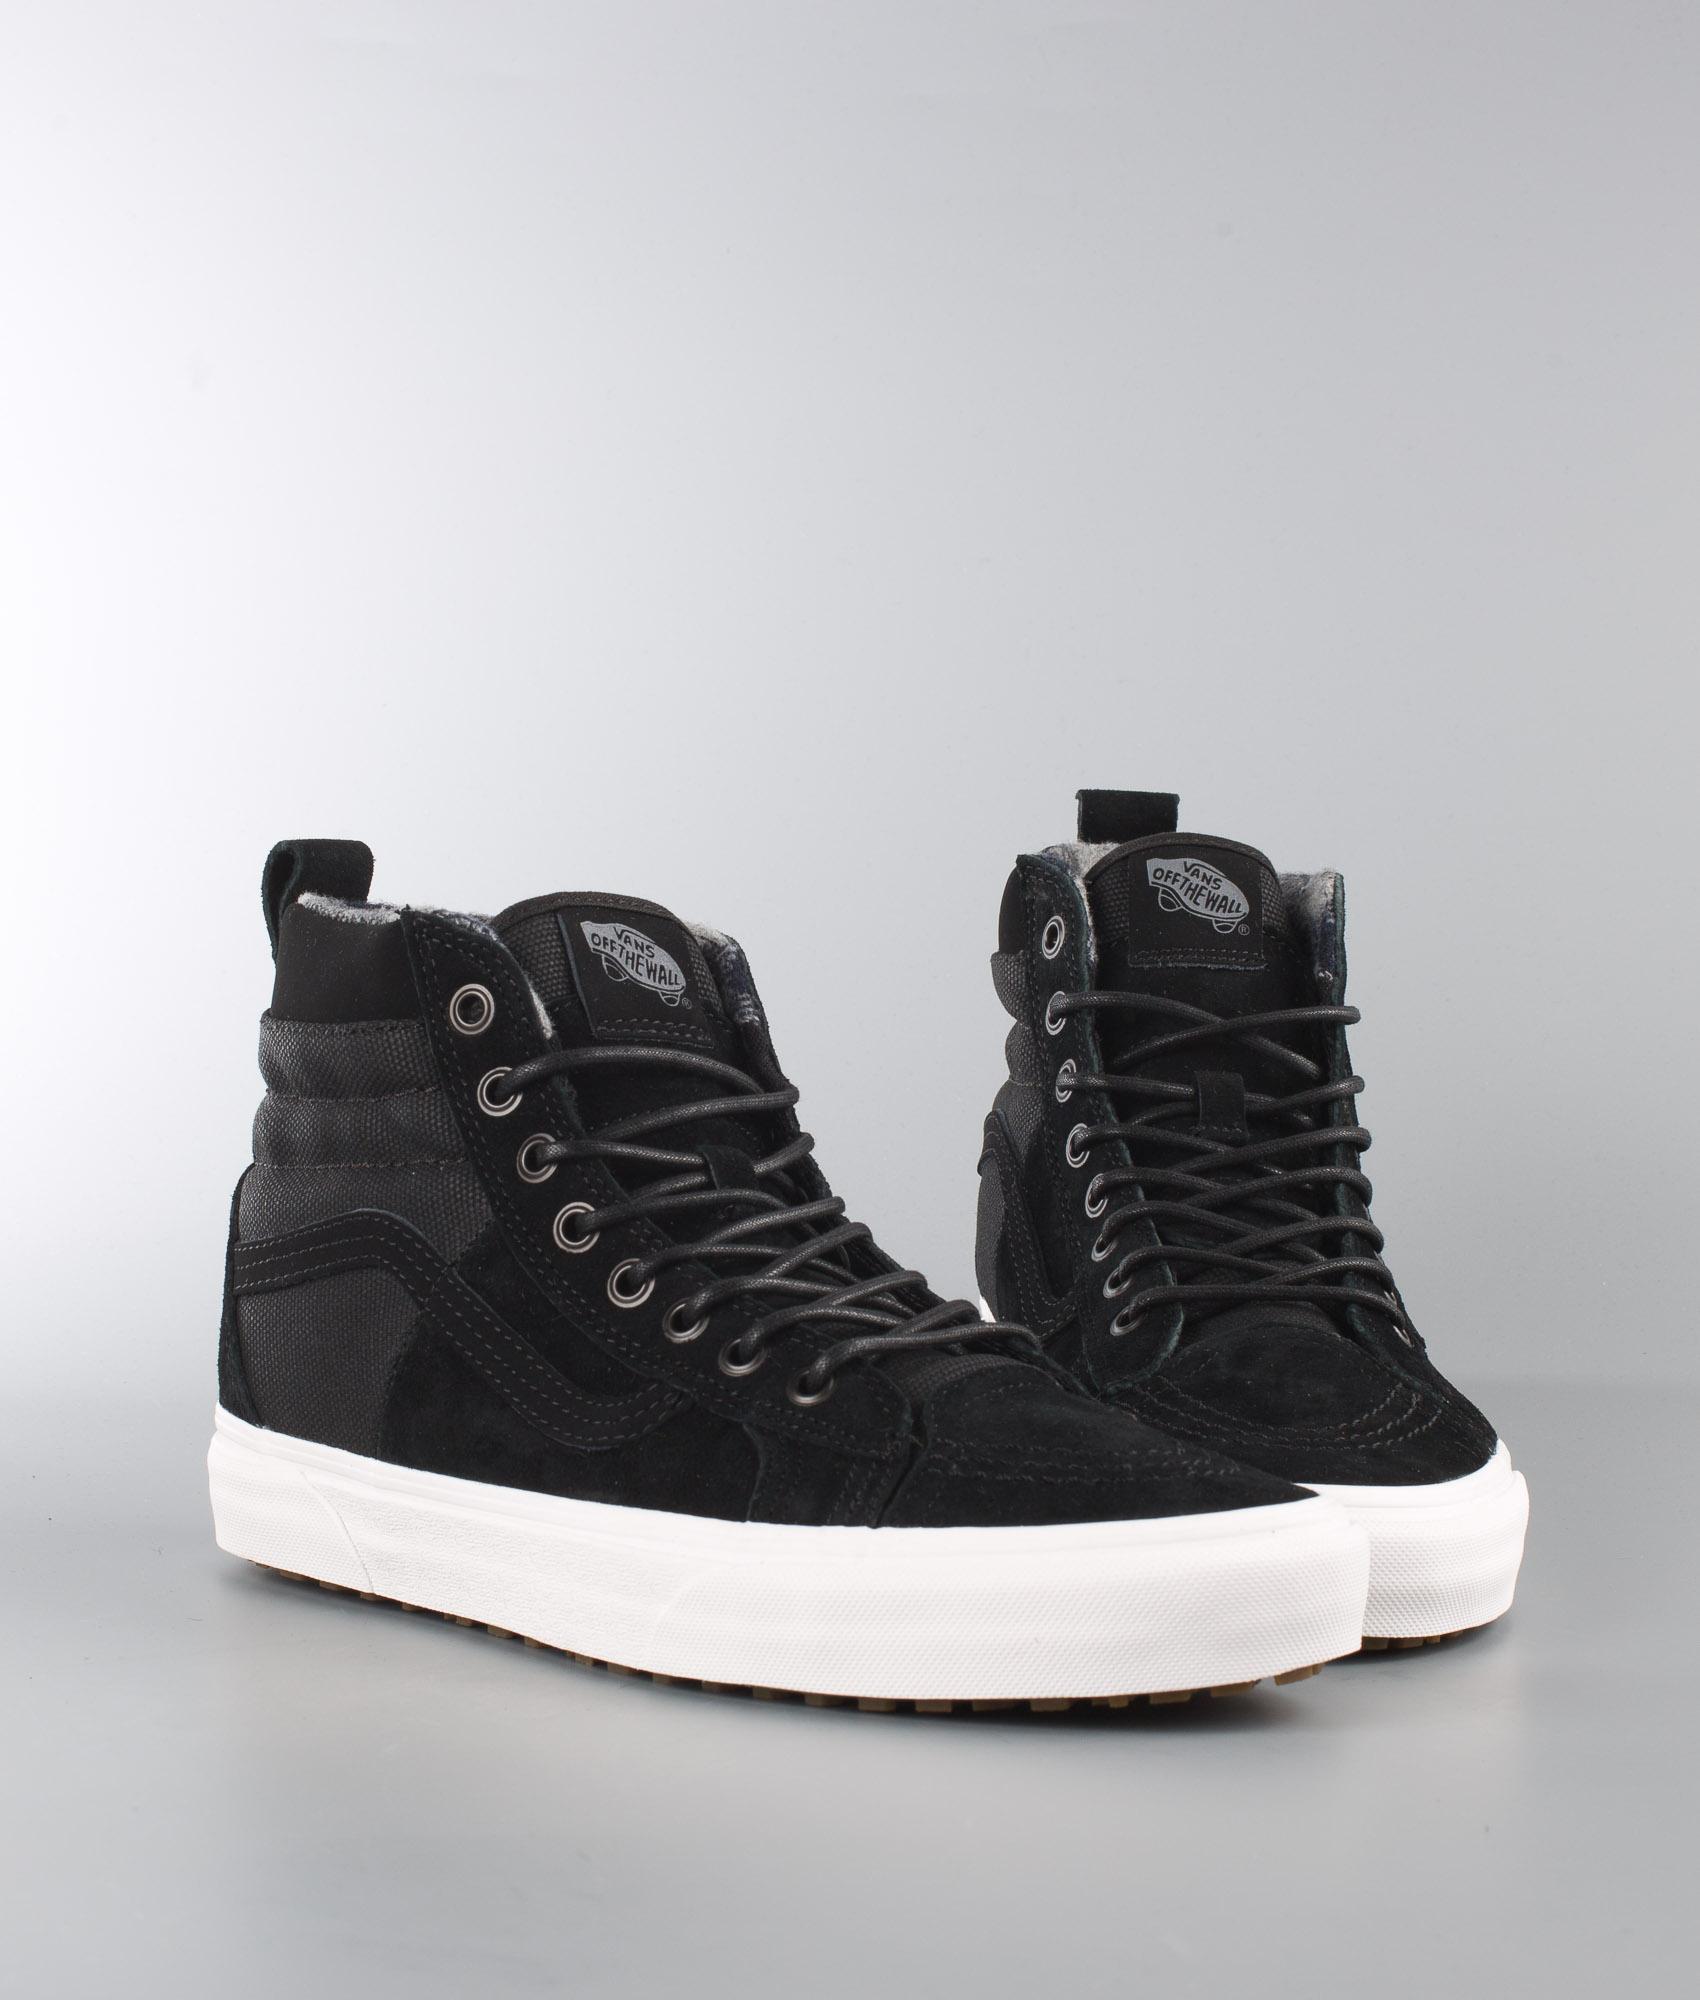 Vans Sk8-Hi 46 Mte Dx Schuhe (Mte) Black/Flannel